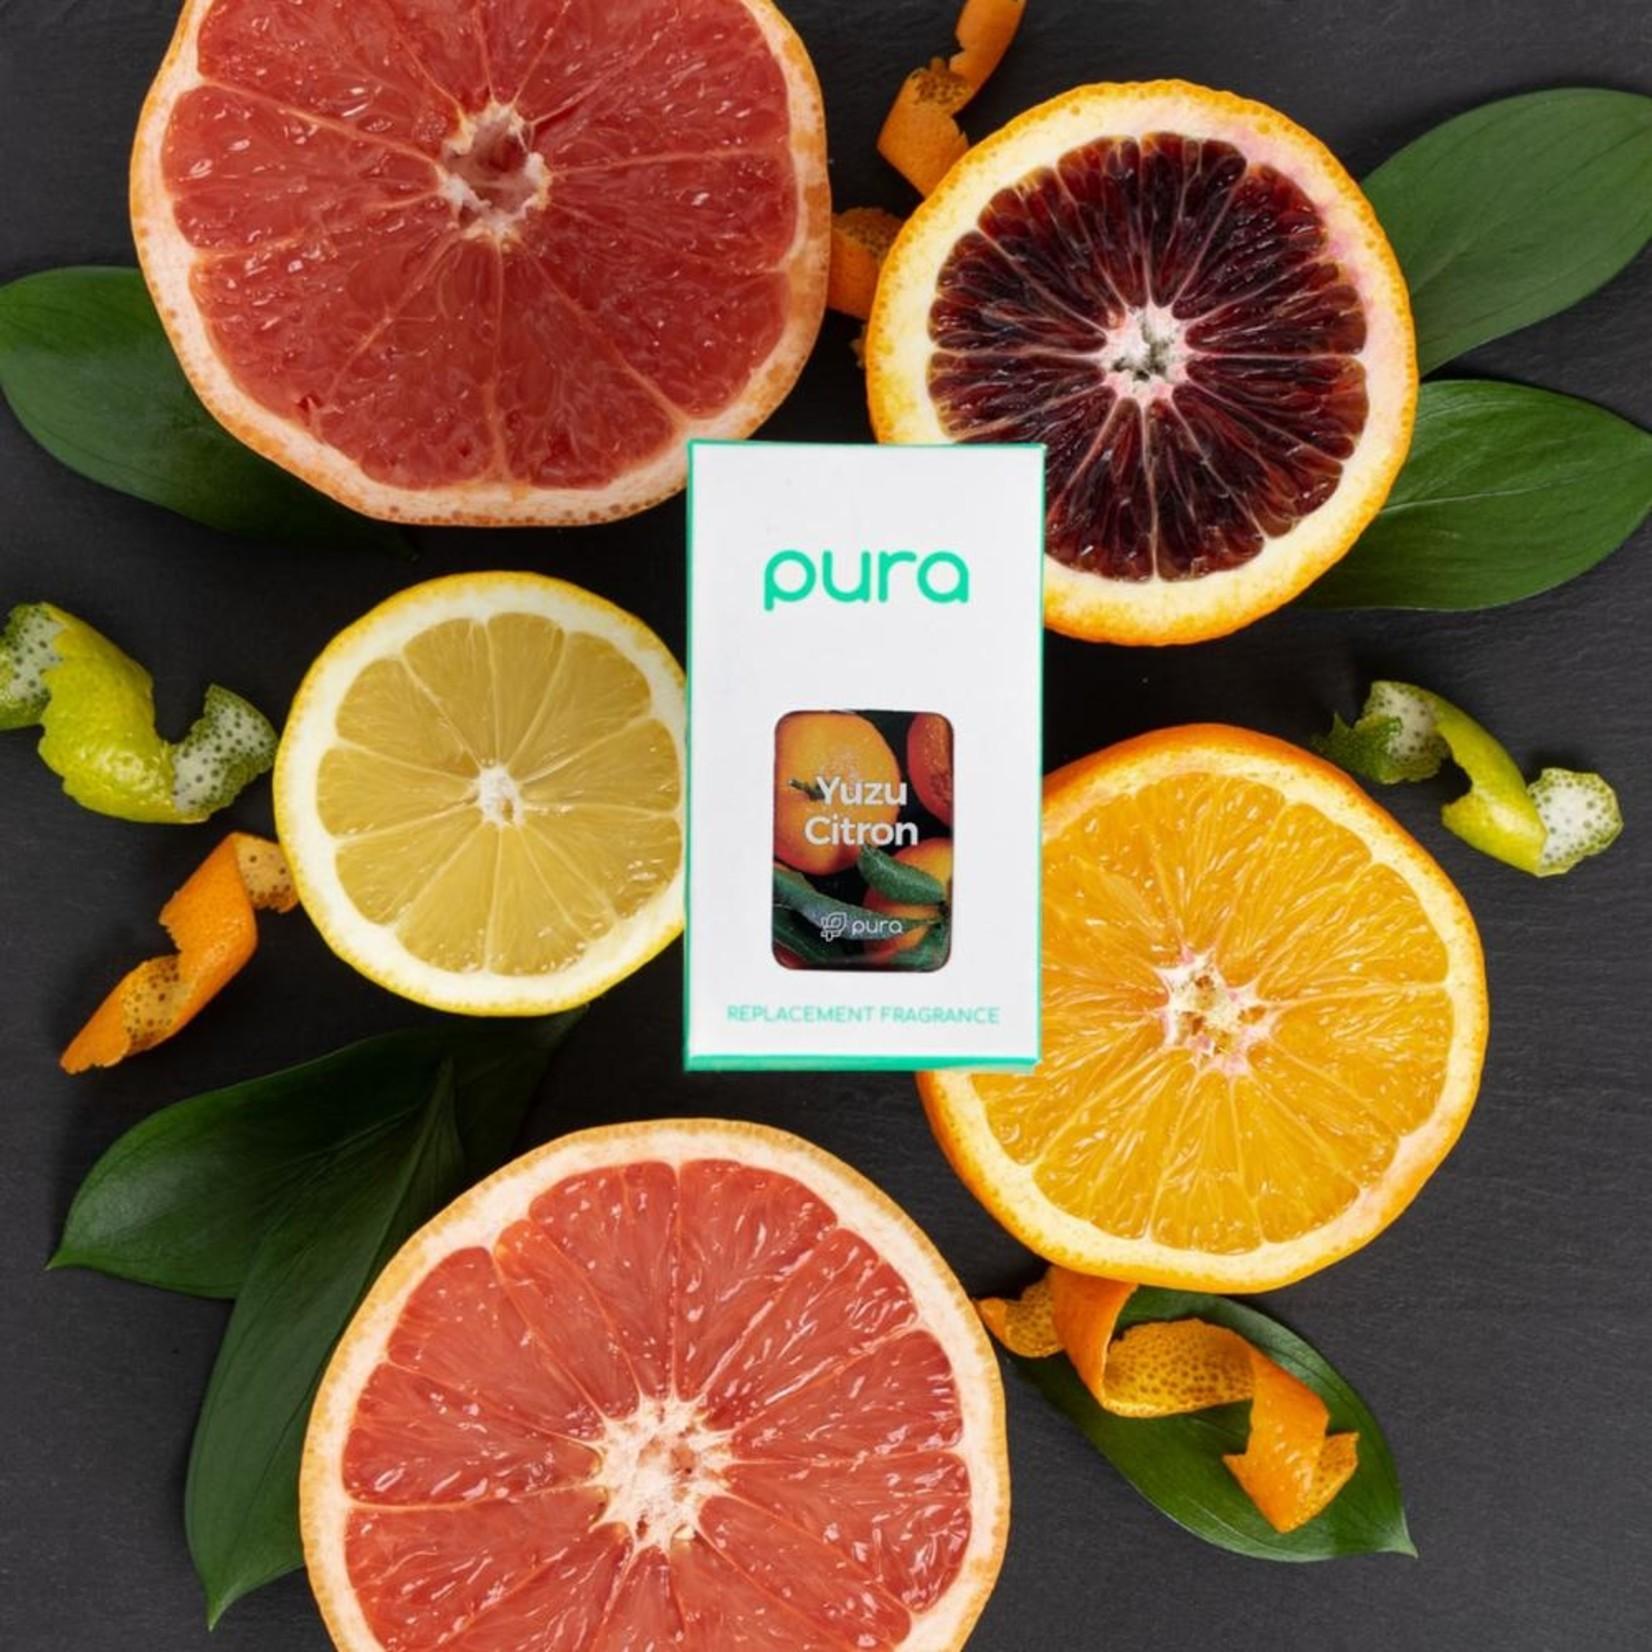 Pura Yuzu Citron Pura Fragrance